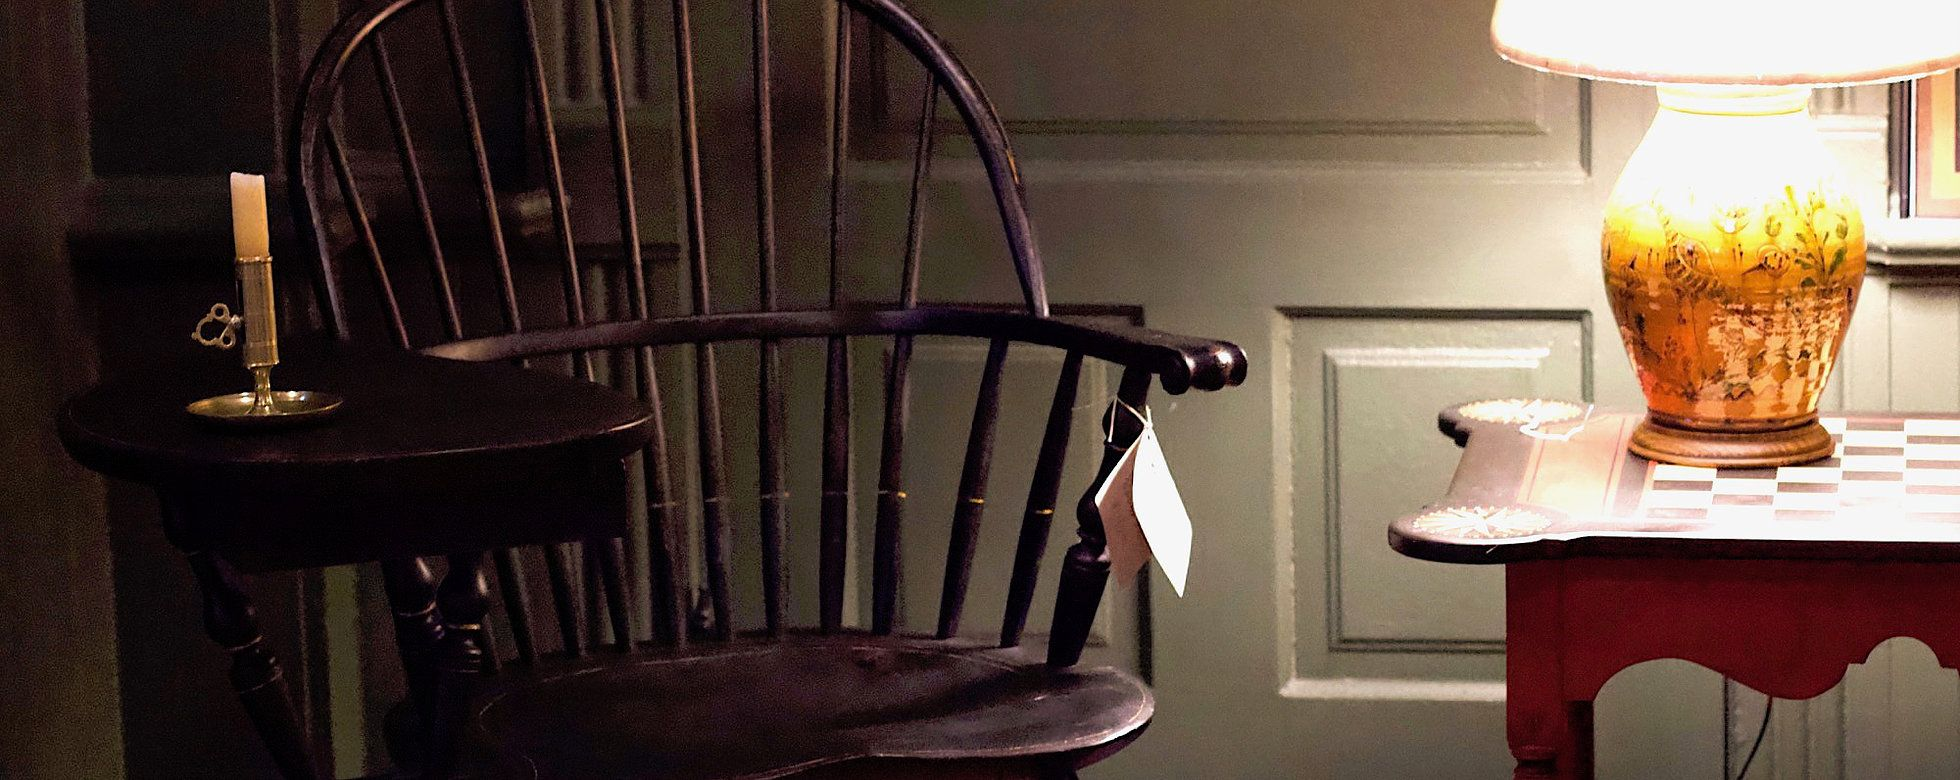 fromourhands Decor, Bar stools, Home decor